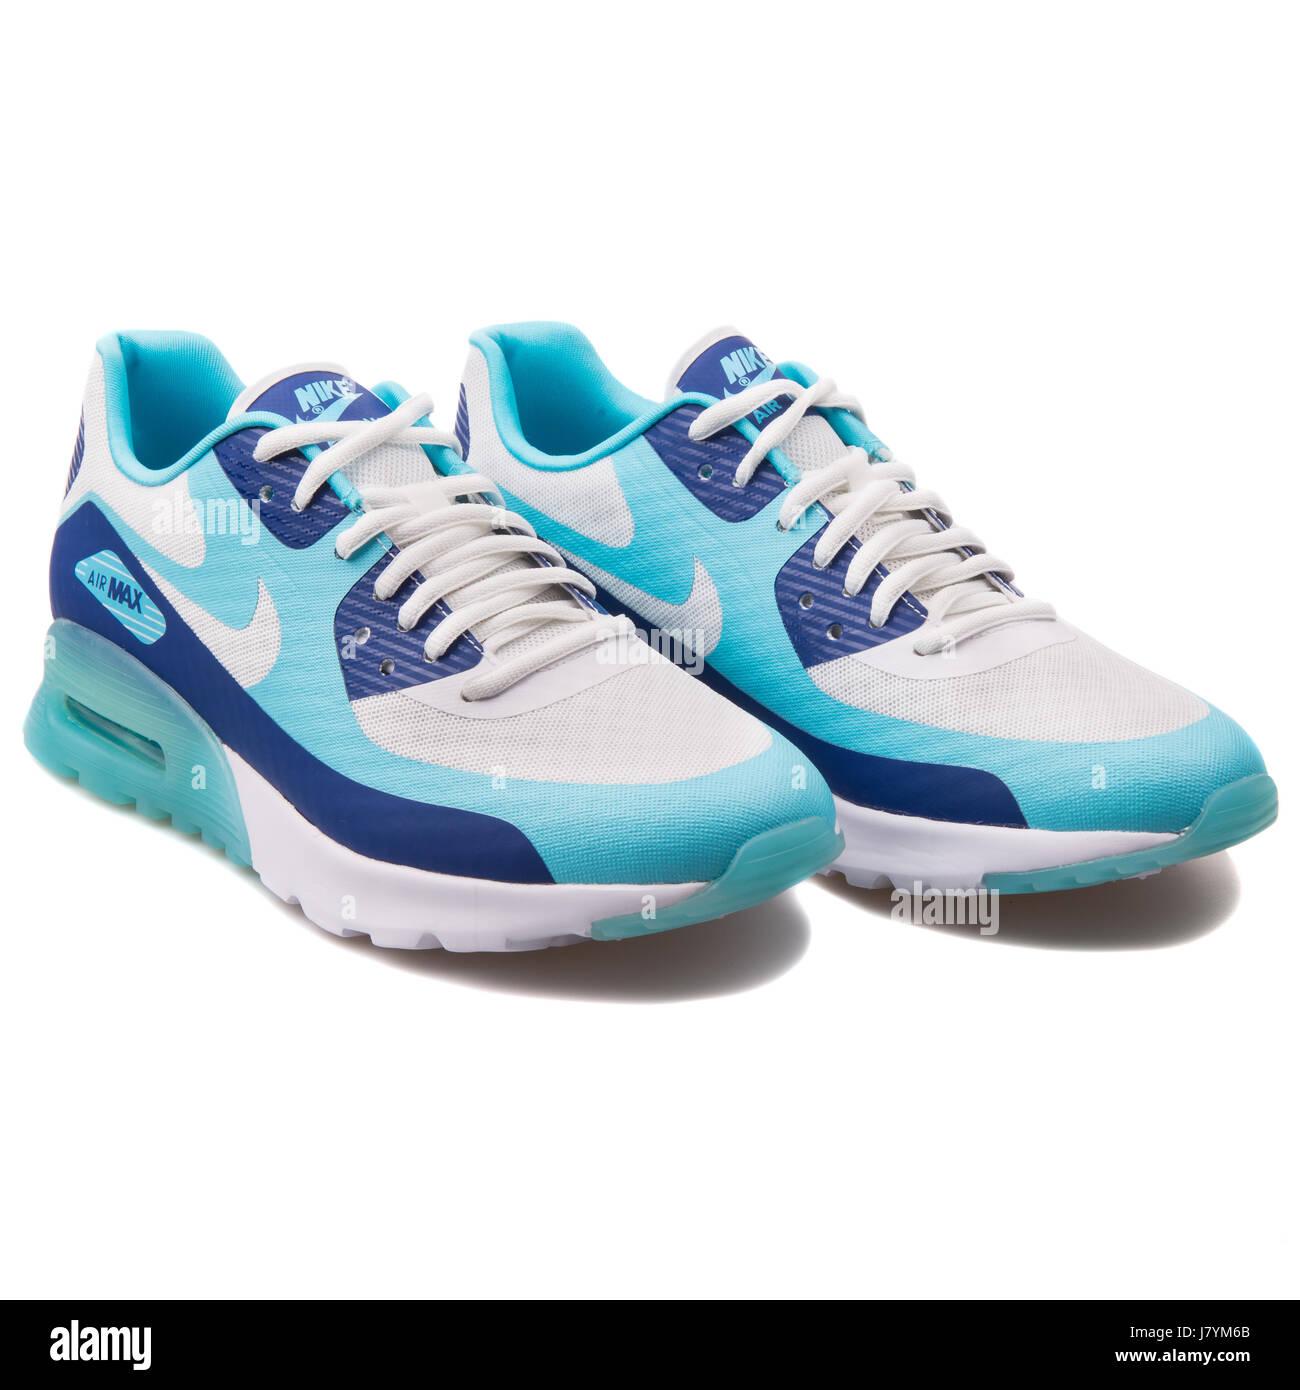 huge discount 99e7d 02f1c Nike Air Max 90 W BR Ultra Deep bleu royal, turquoise et blanc Women s  Running